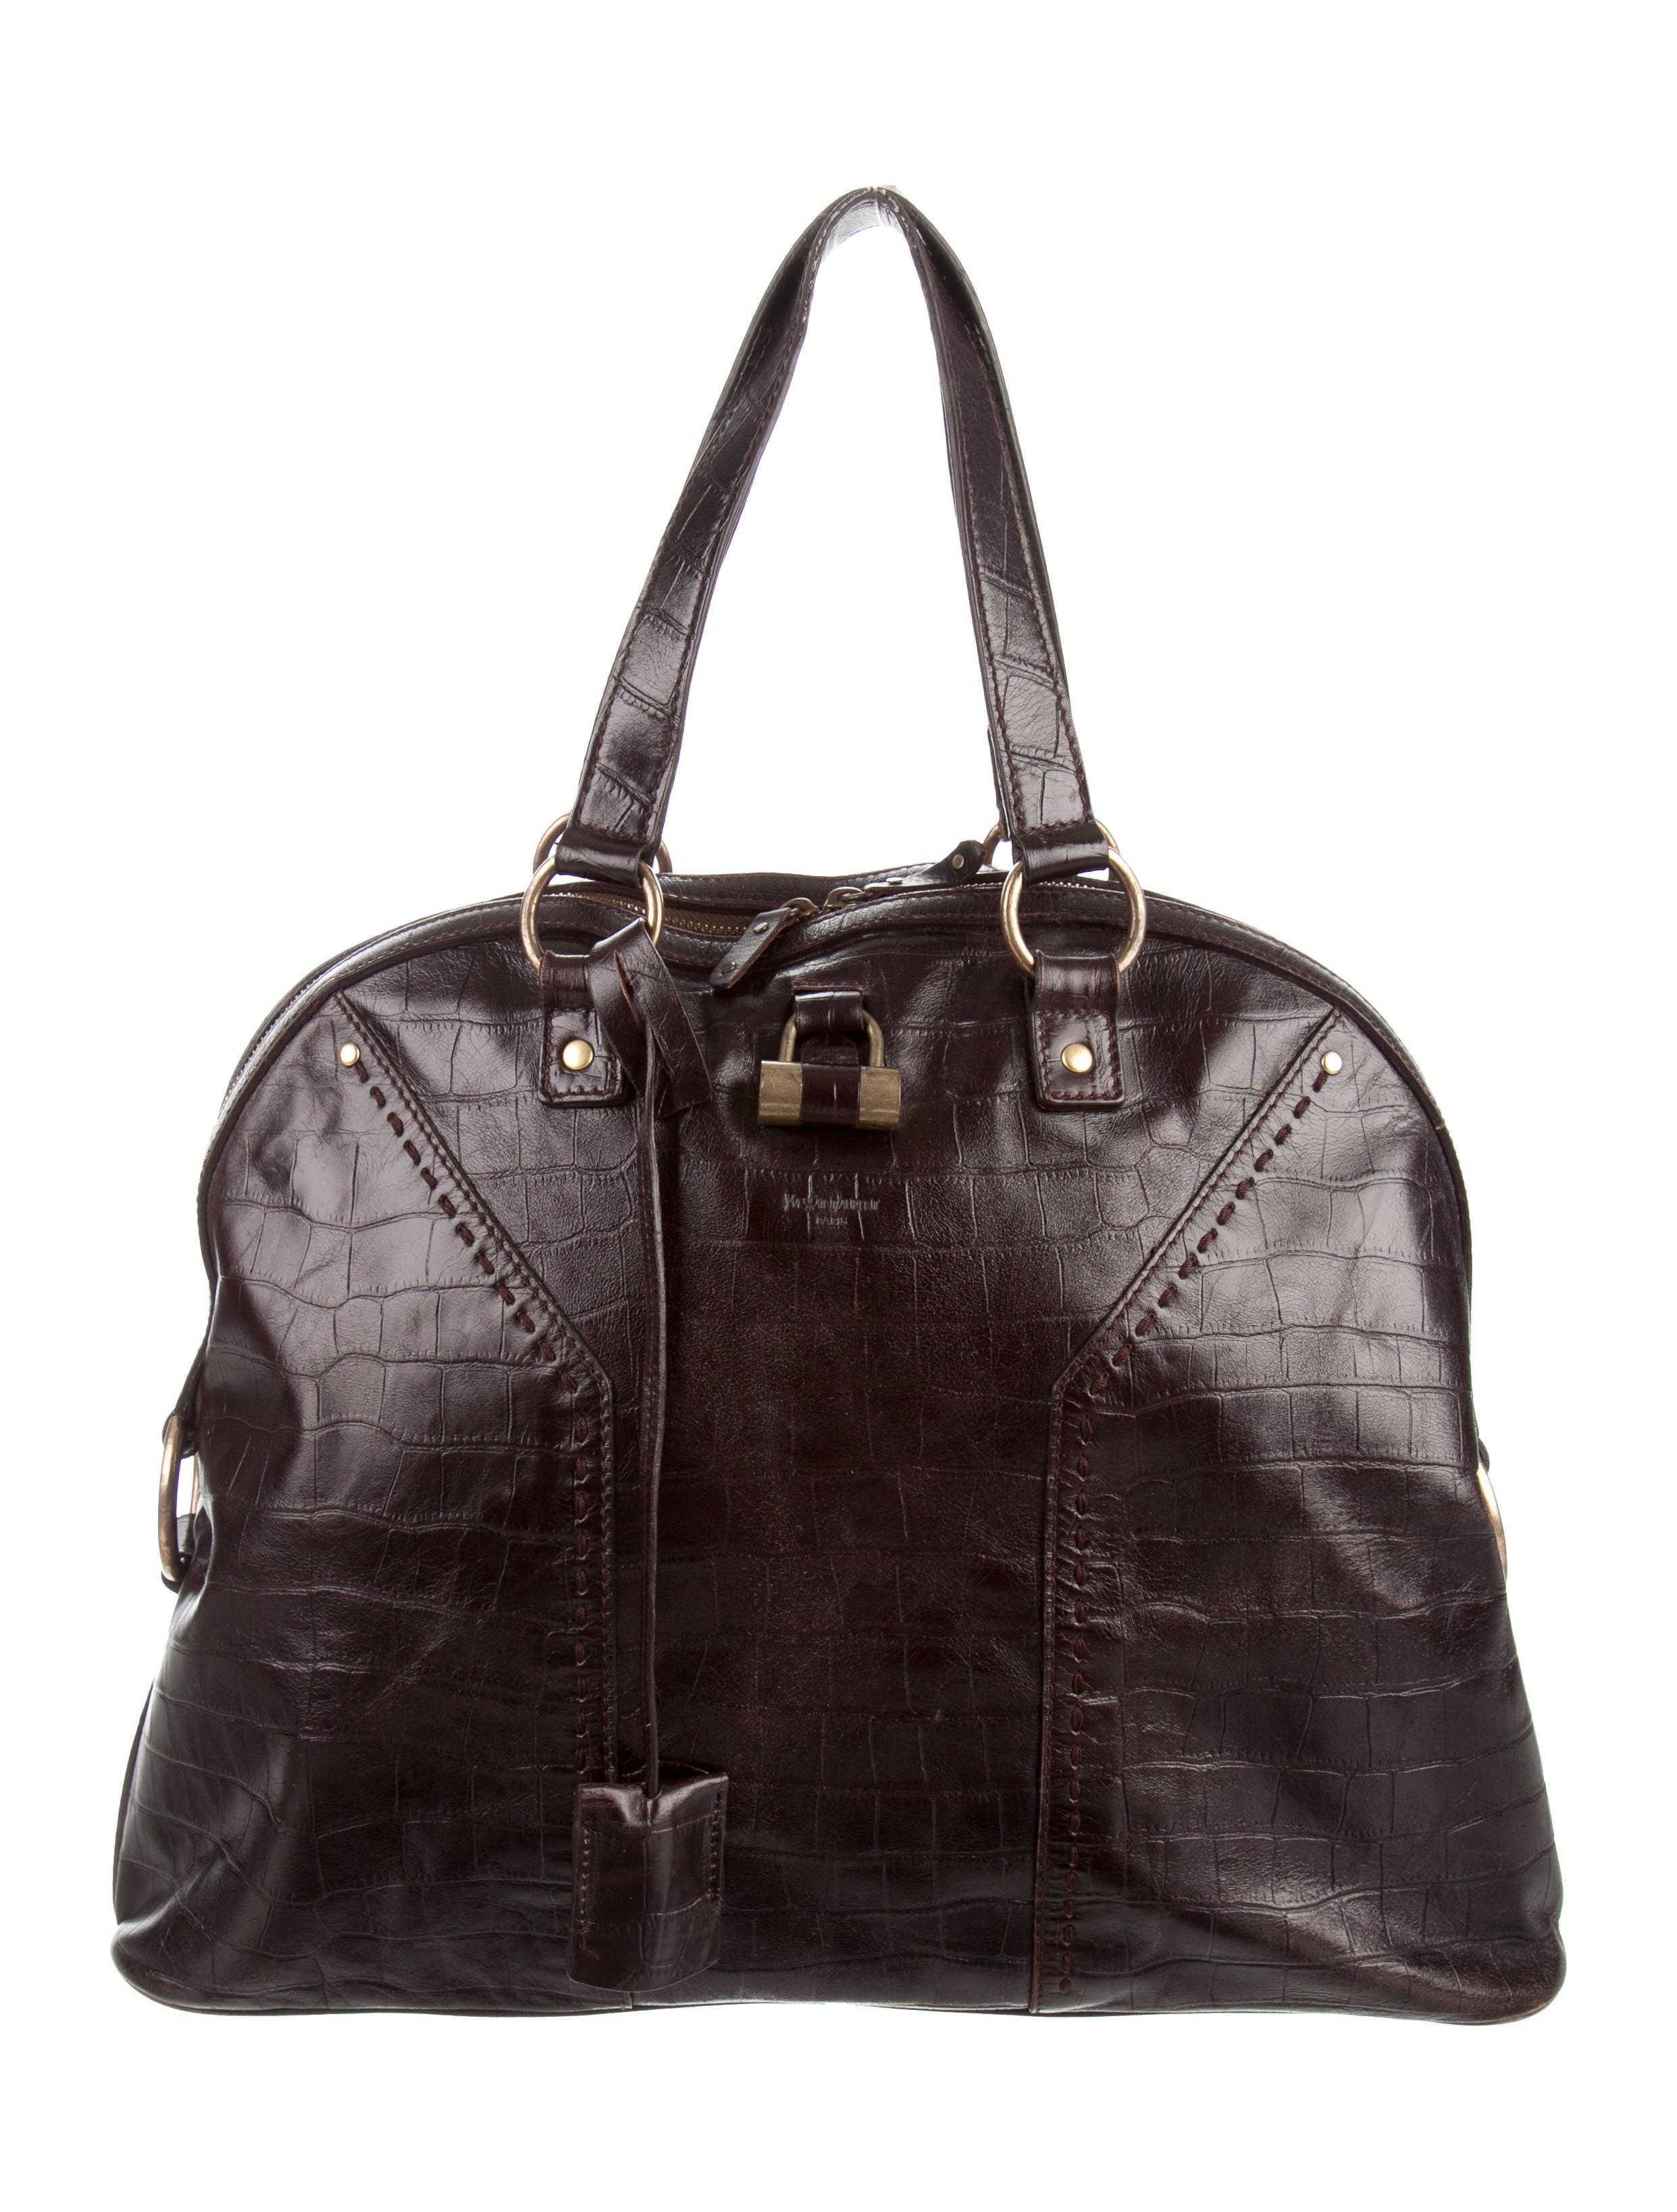 Yves Saint Laurent Embossed Muse Bag - Handbags